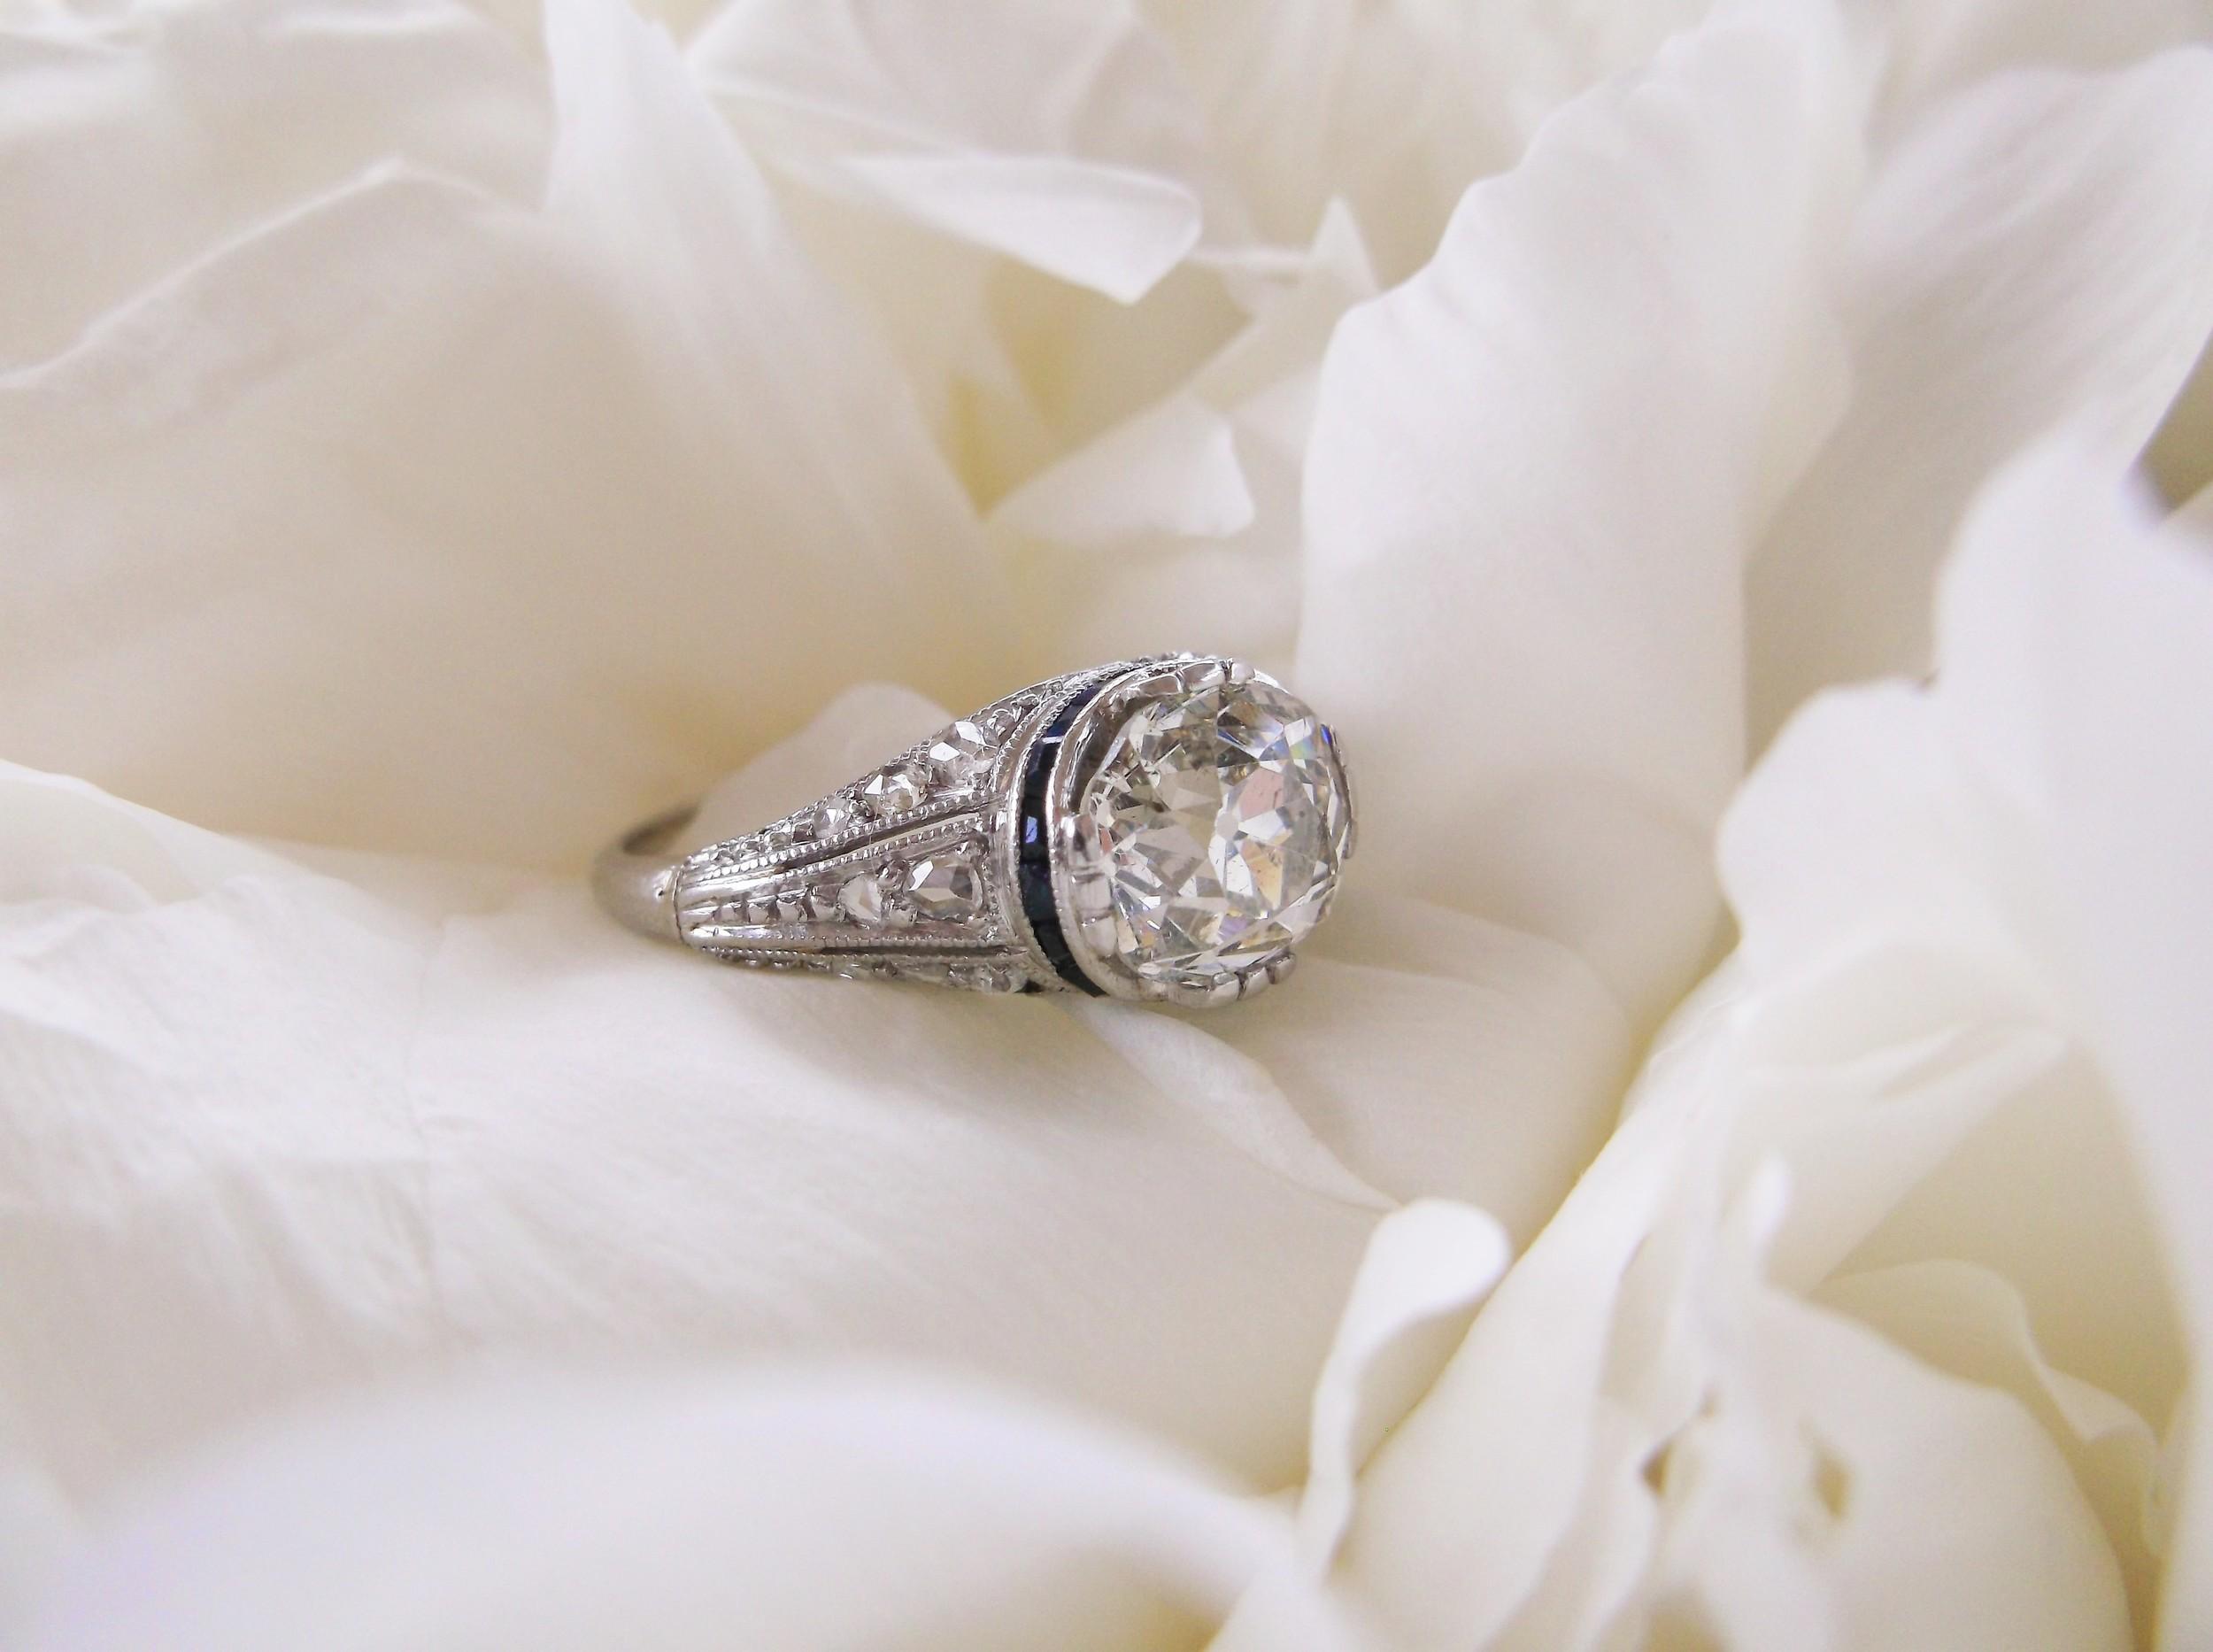 SOLD - Gorgeous 1.85 carat Old Mine cut diamond set in a beautiful Art Deco diamond, sapphire and platinum mounting.